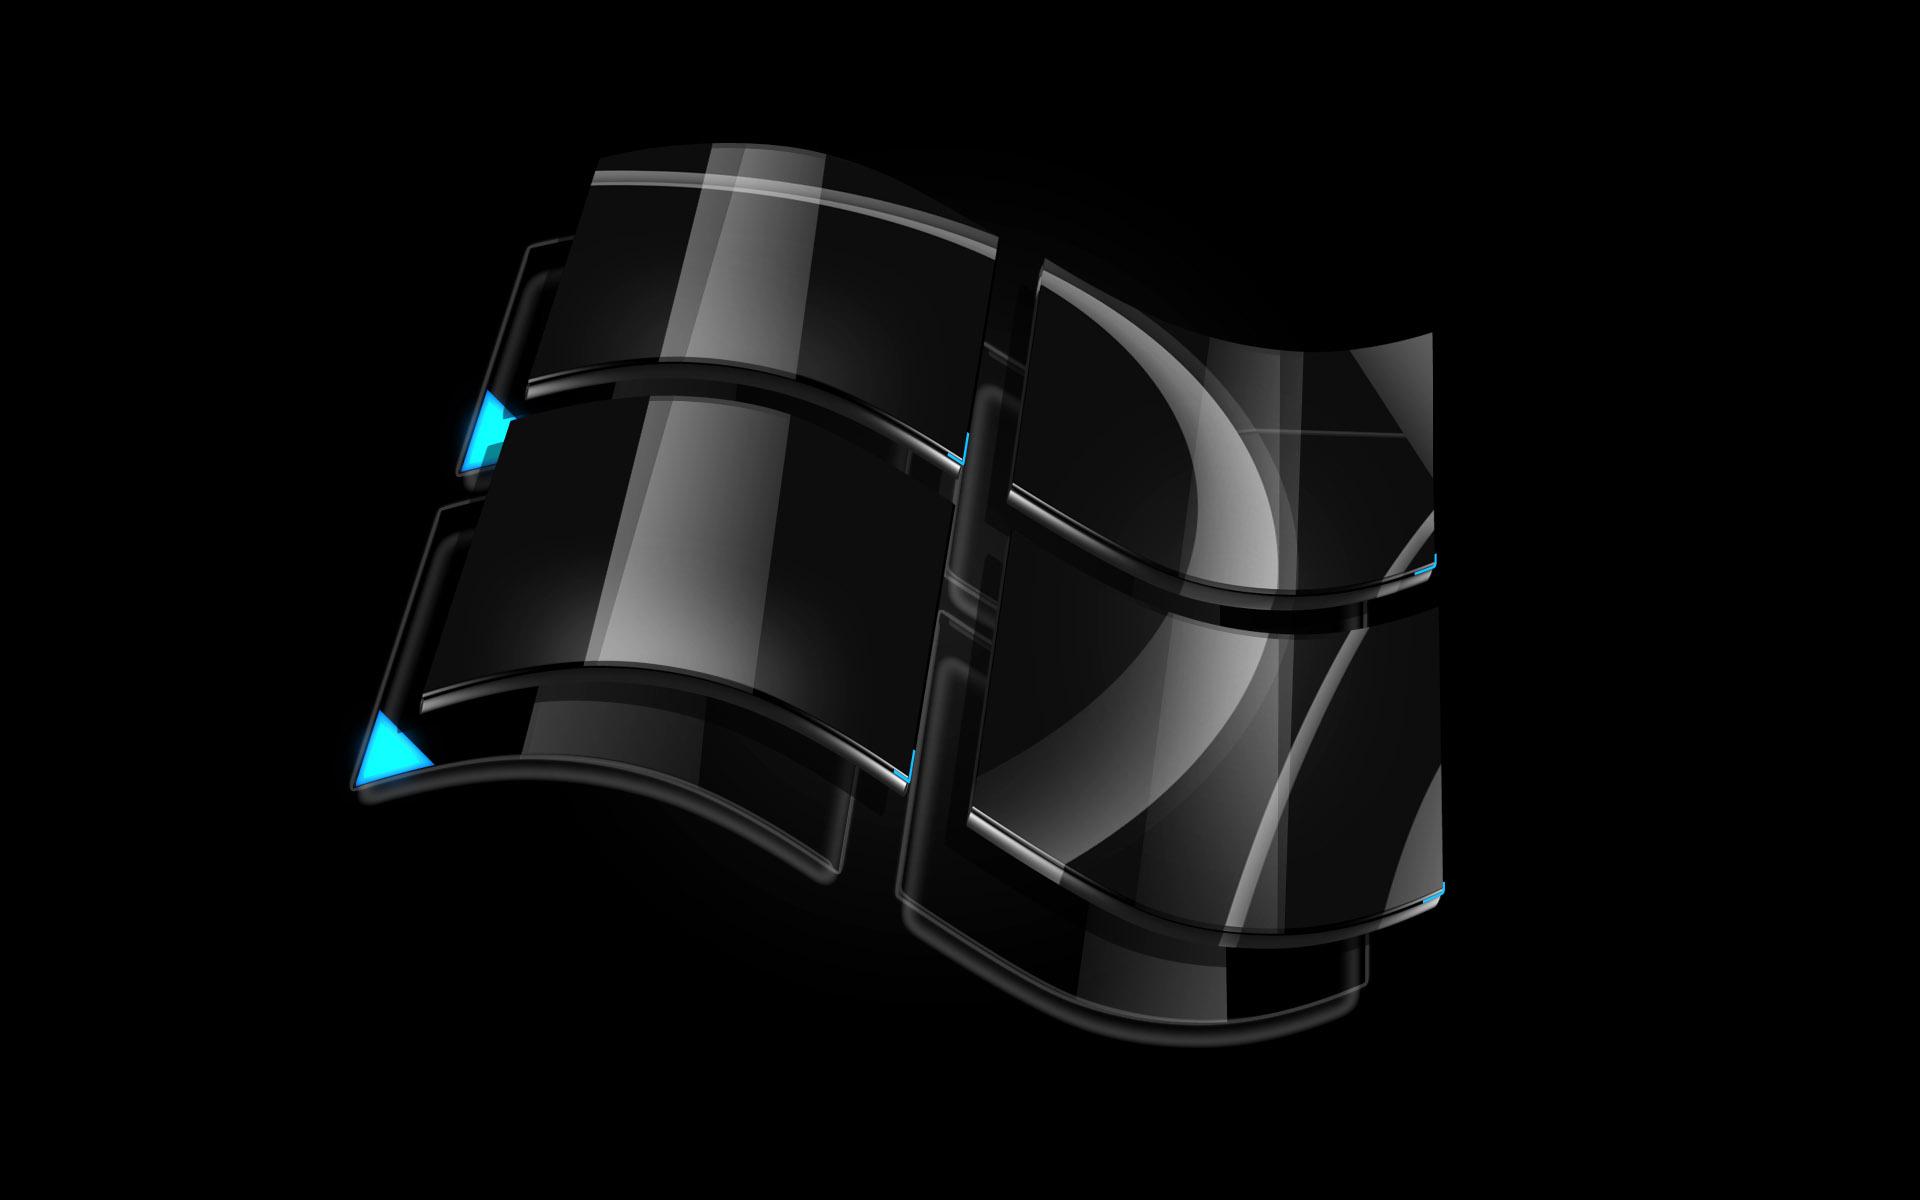 Windows 7 Black Wallpaper Hd Cool